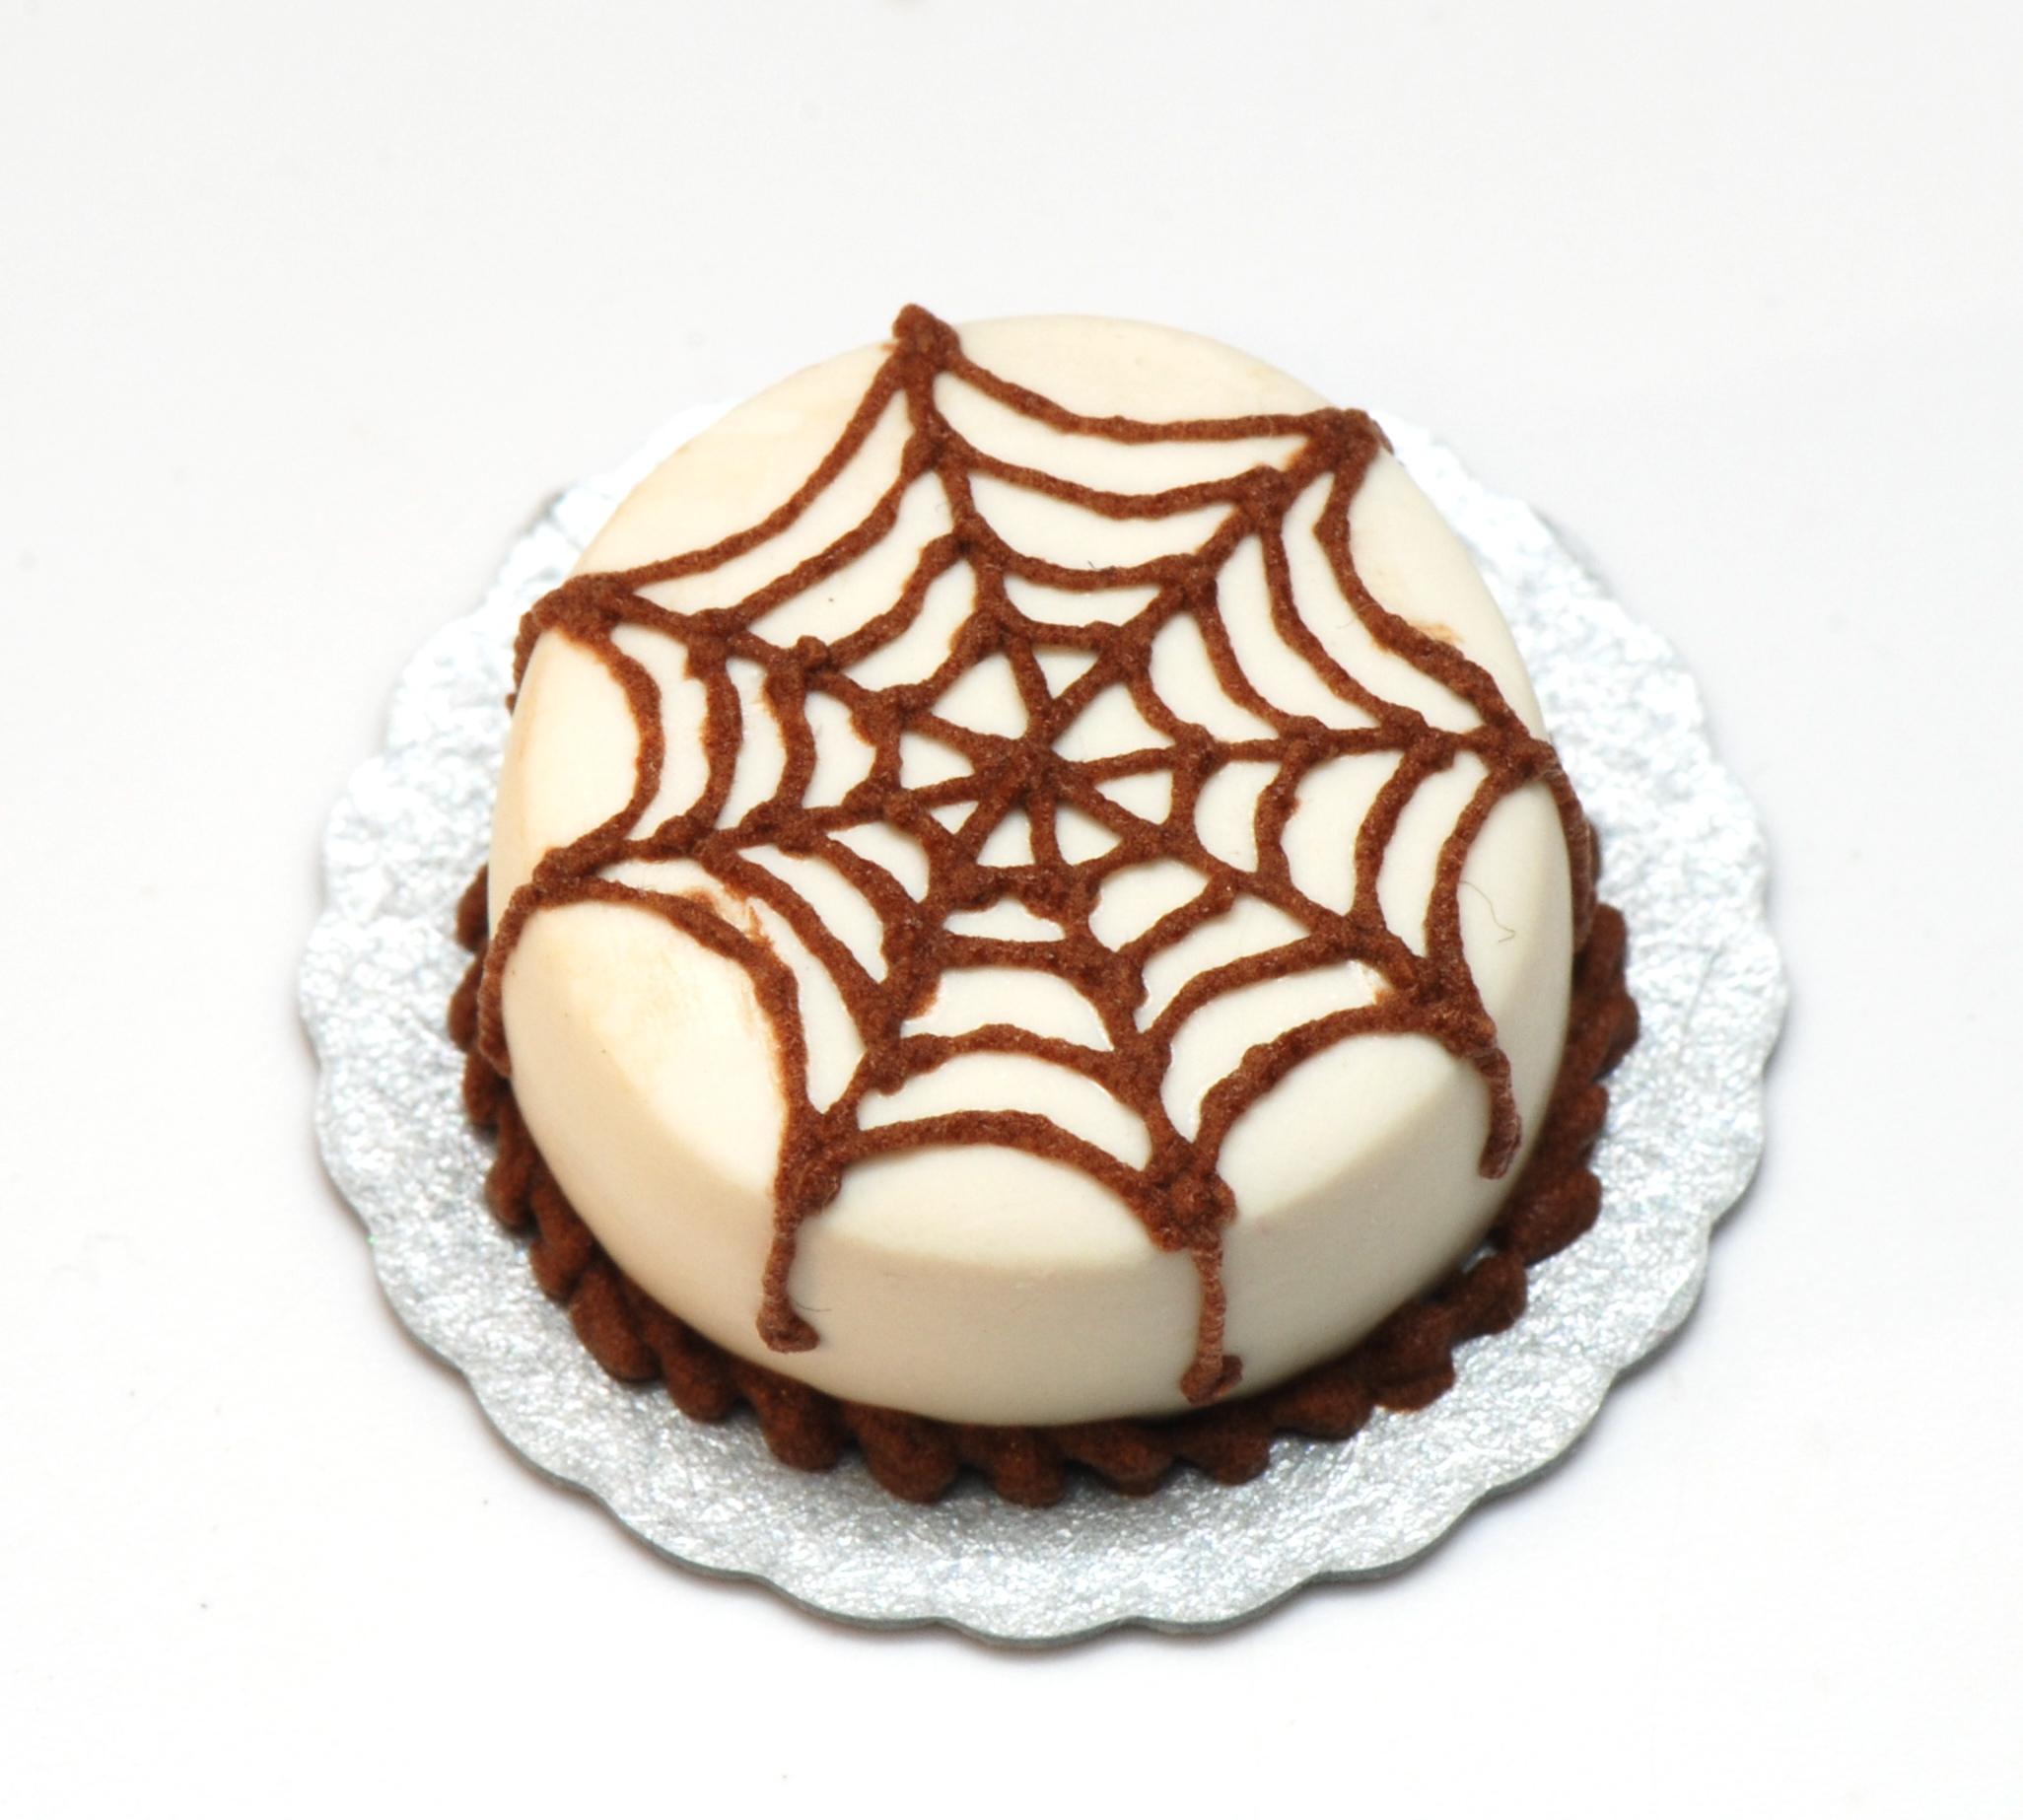 Spider Web Cake Recipe